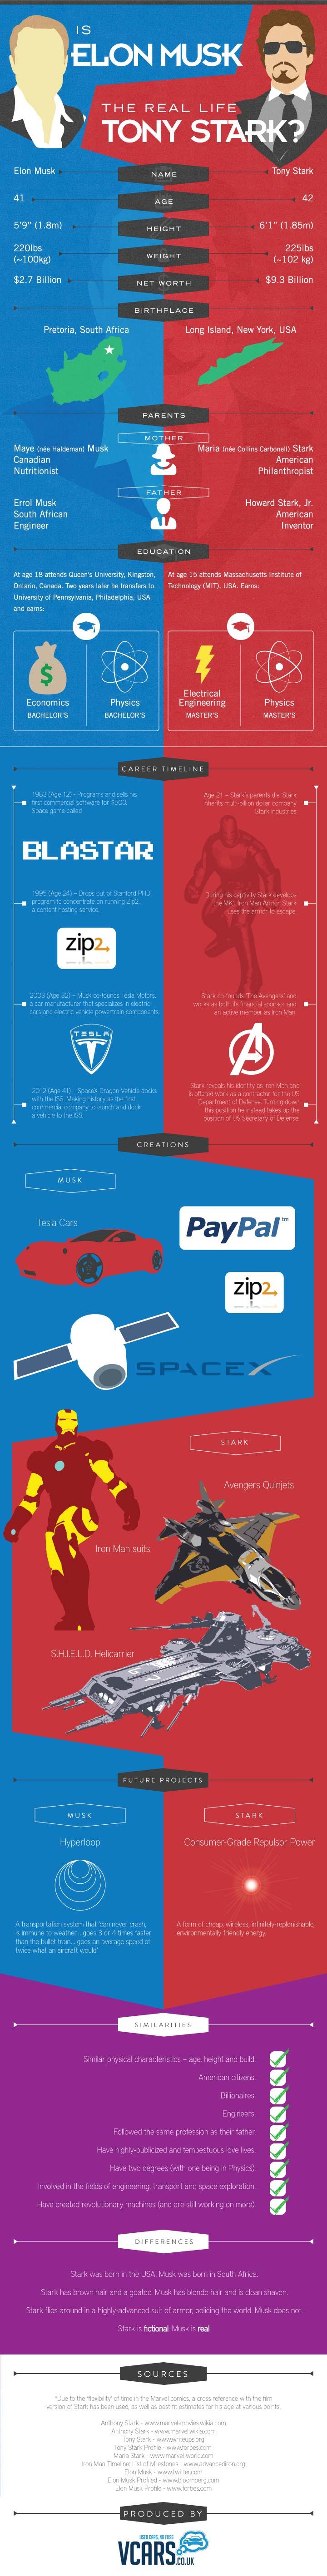 Is-Elon-Musk-The-Real-Life-Tony-Stark-Infographic-infographicsmania